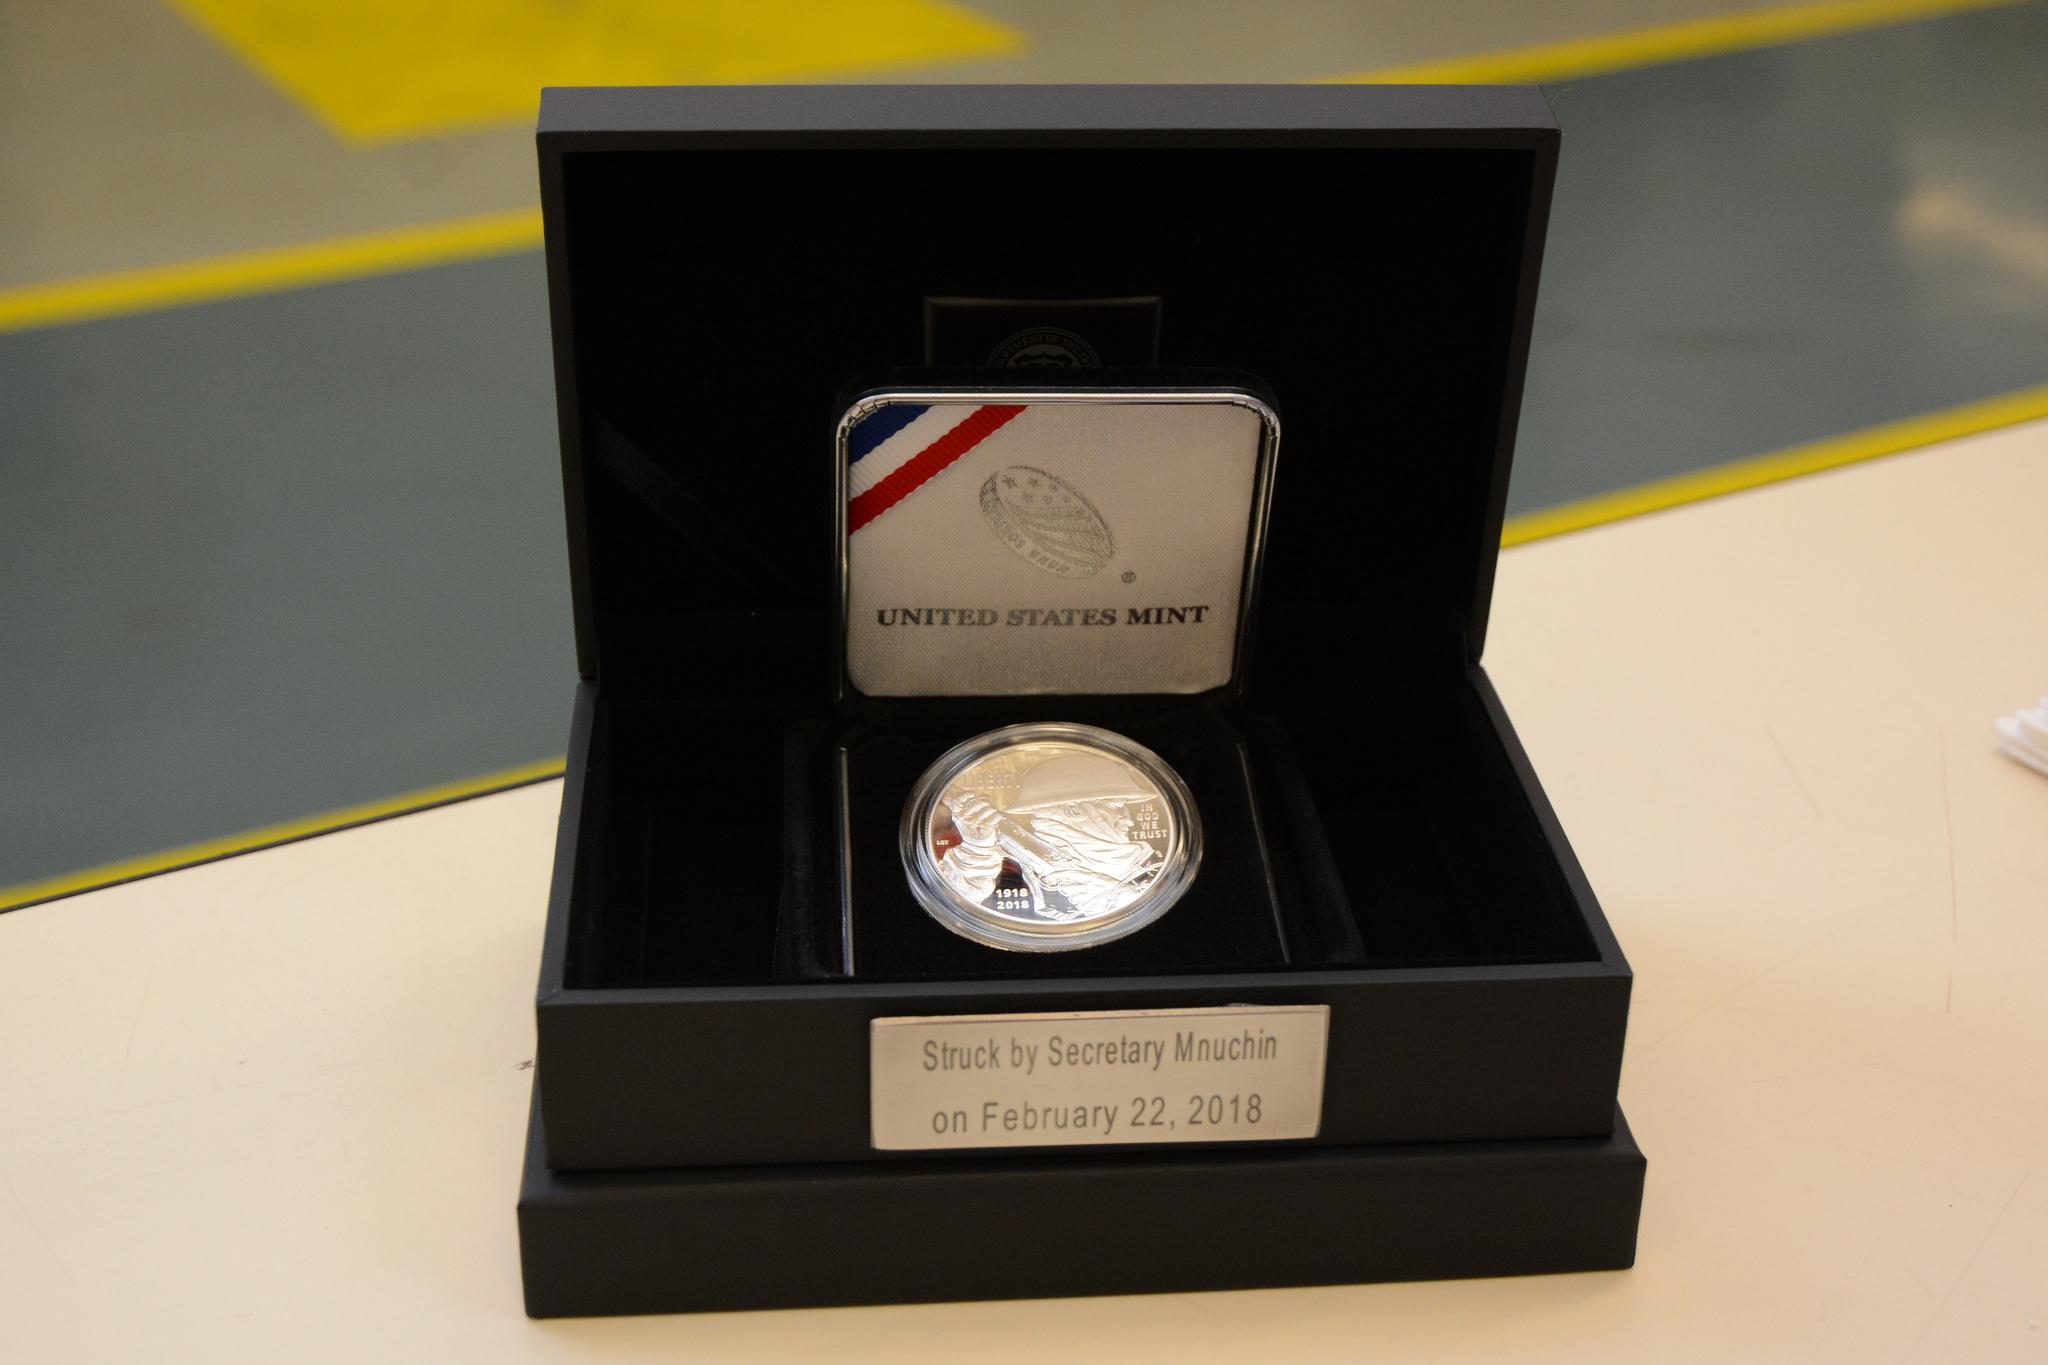 The packaging for the World War I Centennial 2018 Proof Silver Dollar struck by Treasury Secretary Steven Mnuchin at the U.S. Mint facility in Philadelphia on February 22, 2018. U.S. Mint photo by Jill Westeyn.